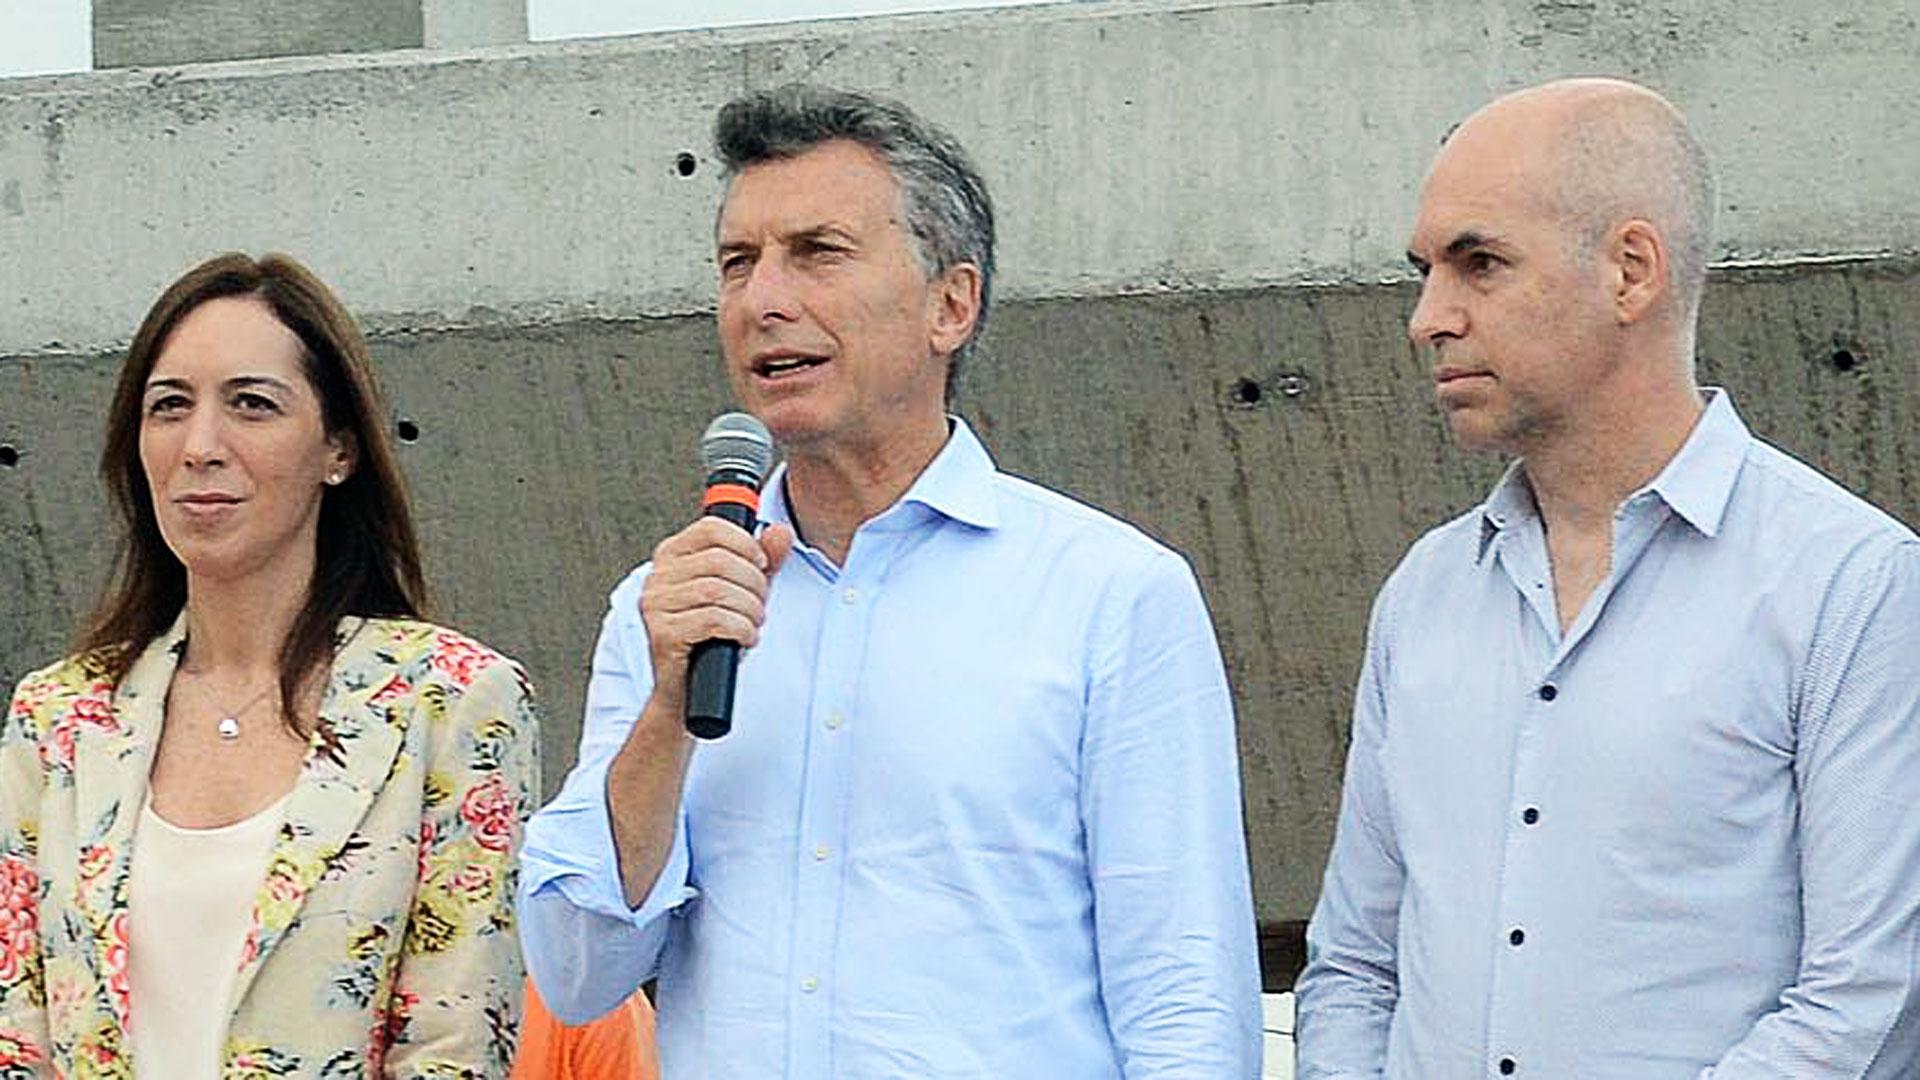 Maria Eugenia Vidal, Mauricio Macri y Rodriguez Larreta (NA)